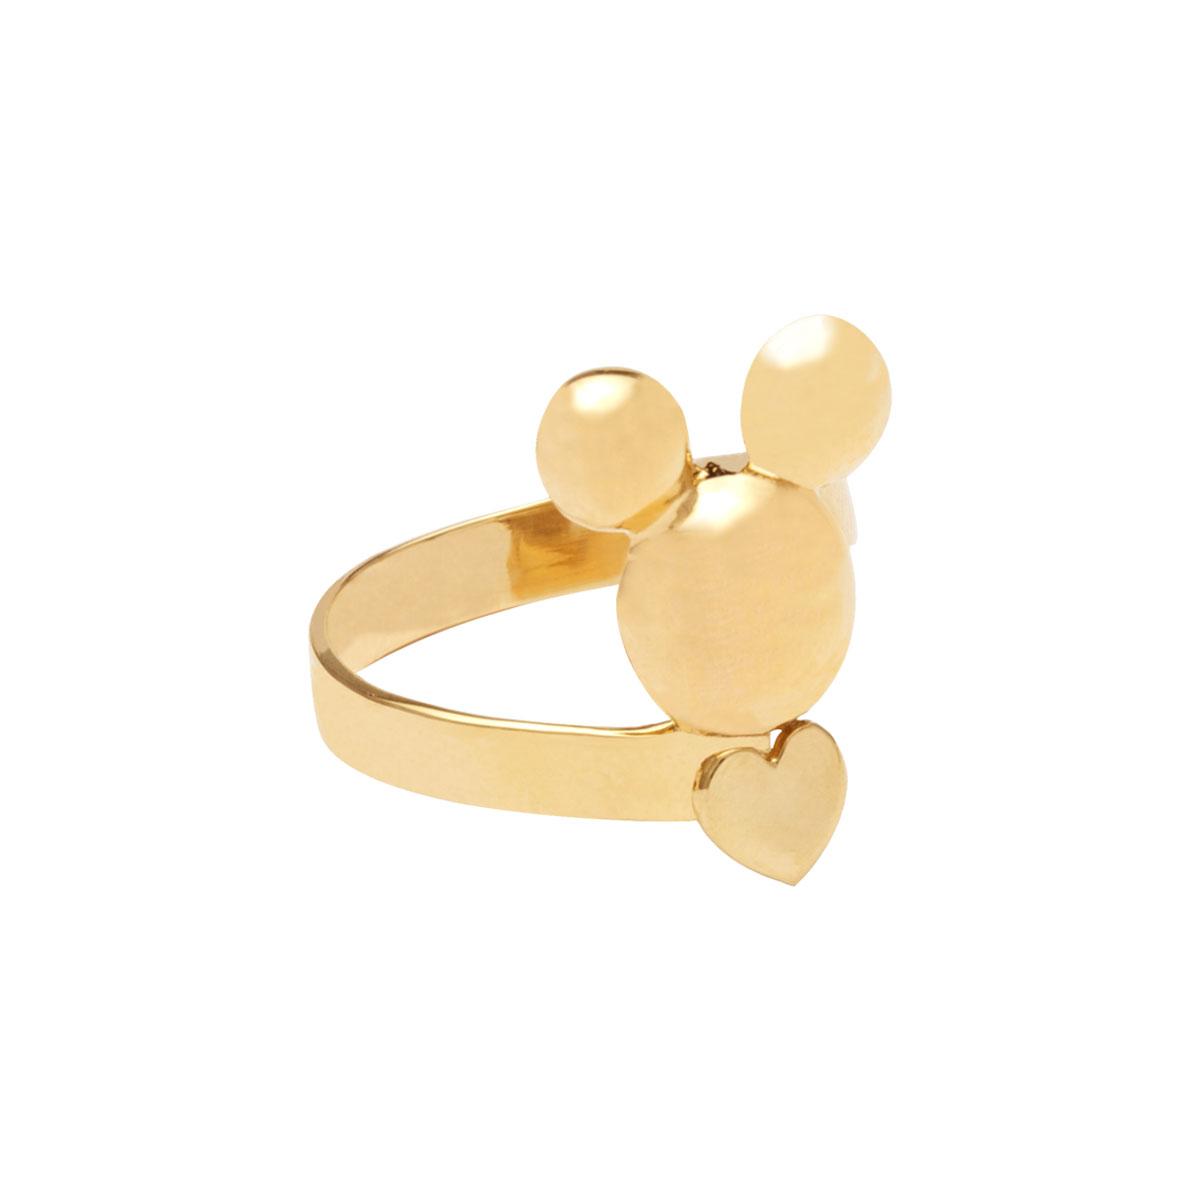 انگشتر طلا Mickey mouse و قلب ۲